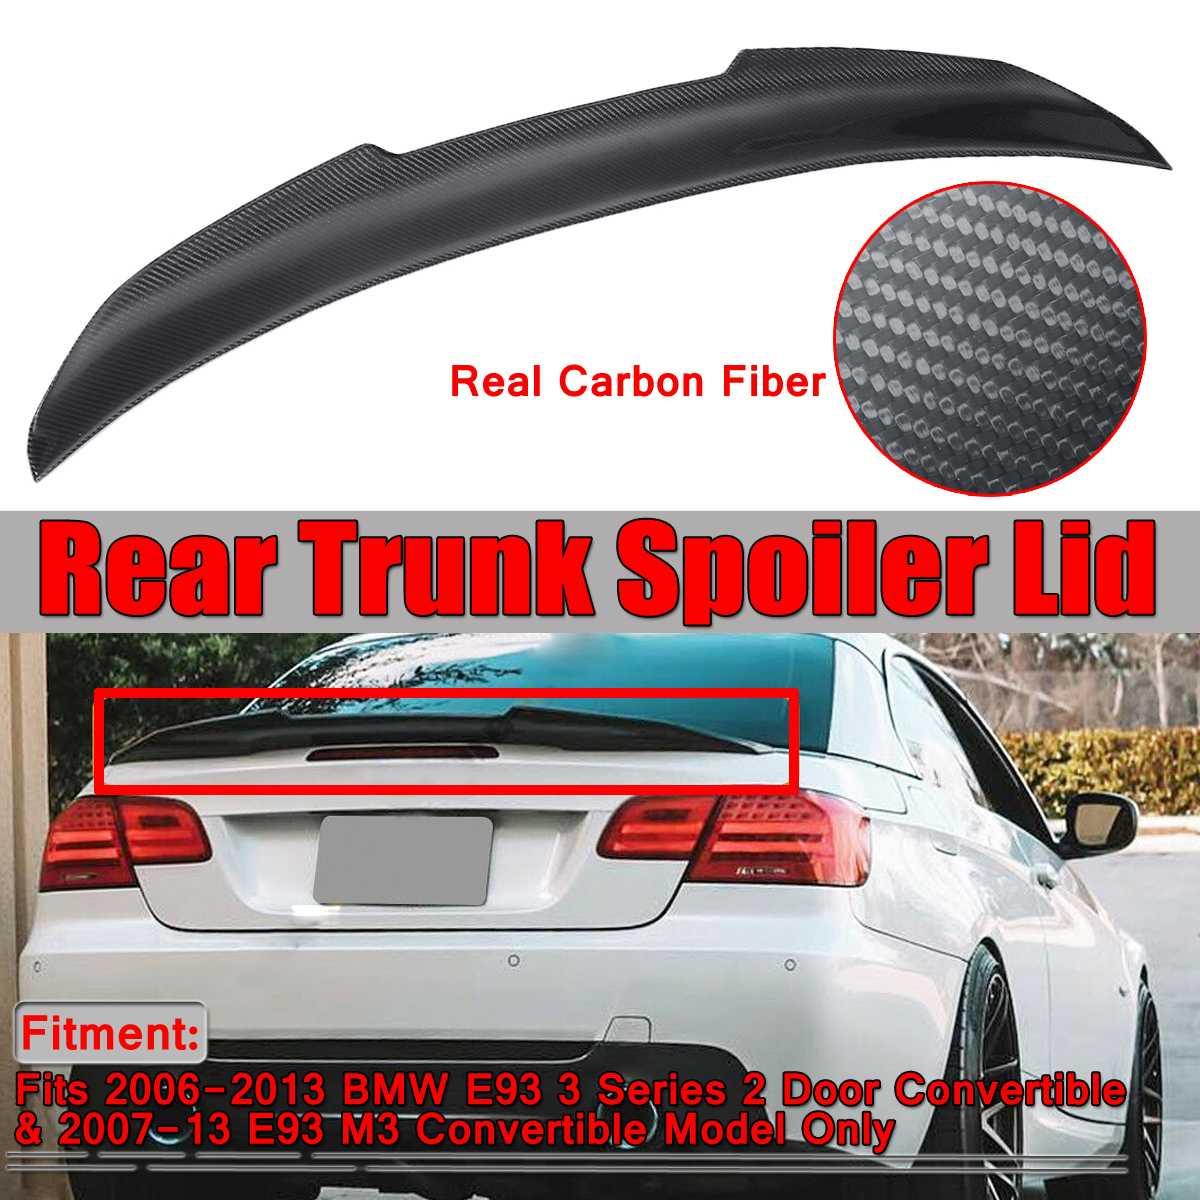 Rear Trunk Spoiler Wing Factory Carbon Fiber For BMW E93 M3 Convertible 07-13